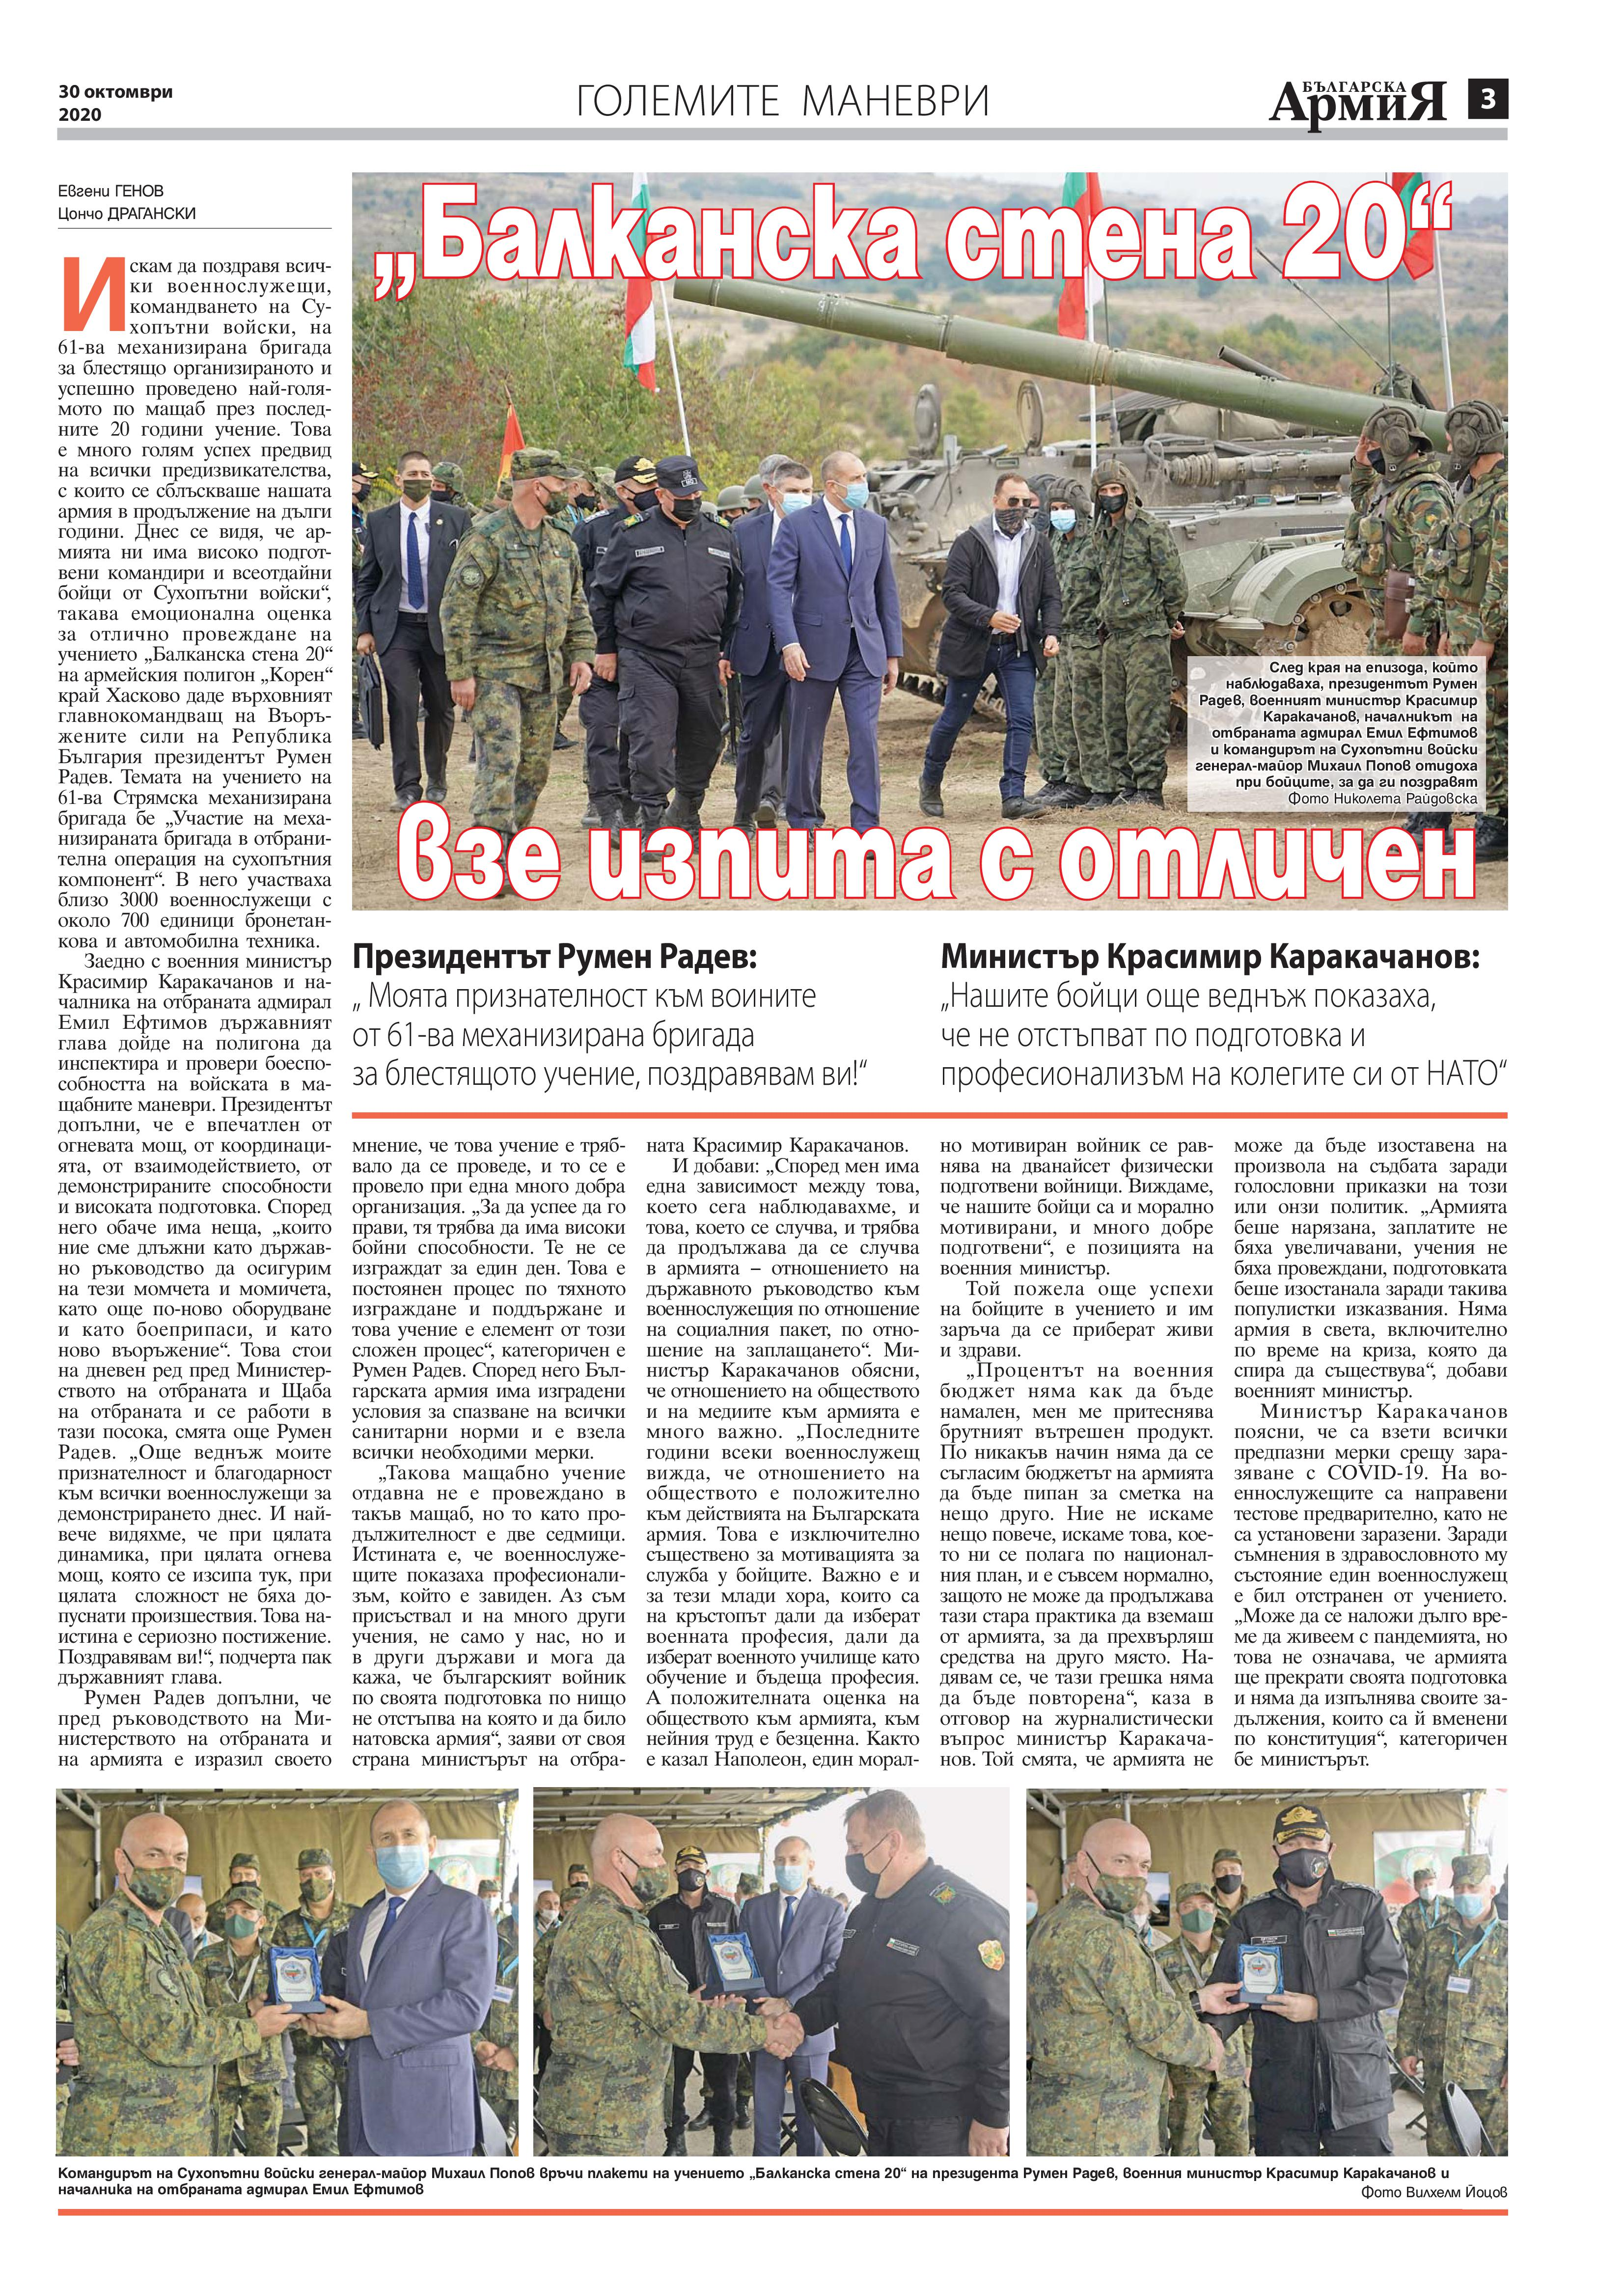 https://www.armymedia.bg/wp-content/uploads/2015/06/03-45.jpg